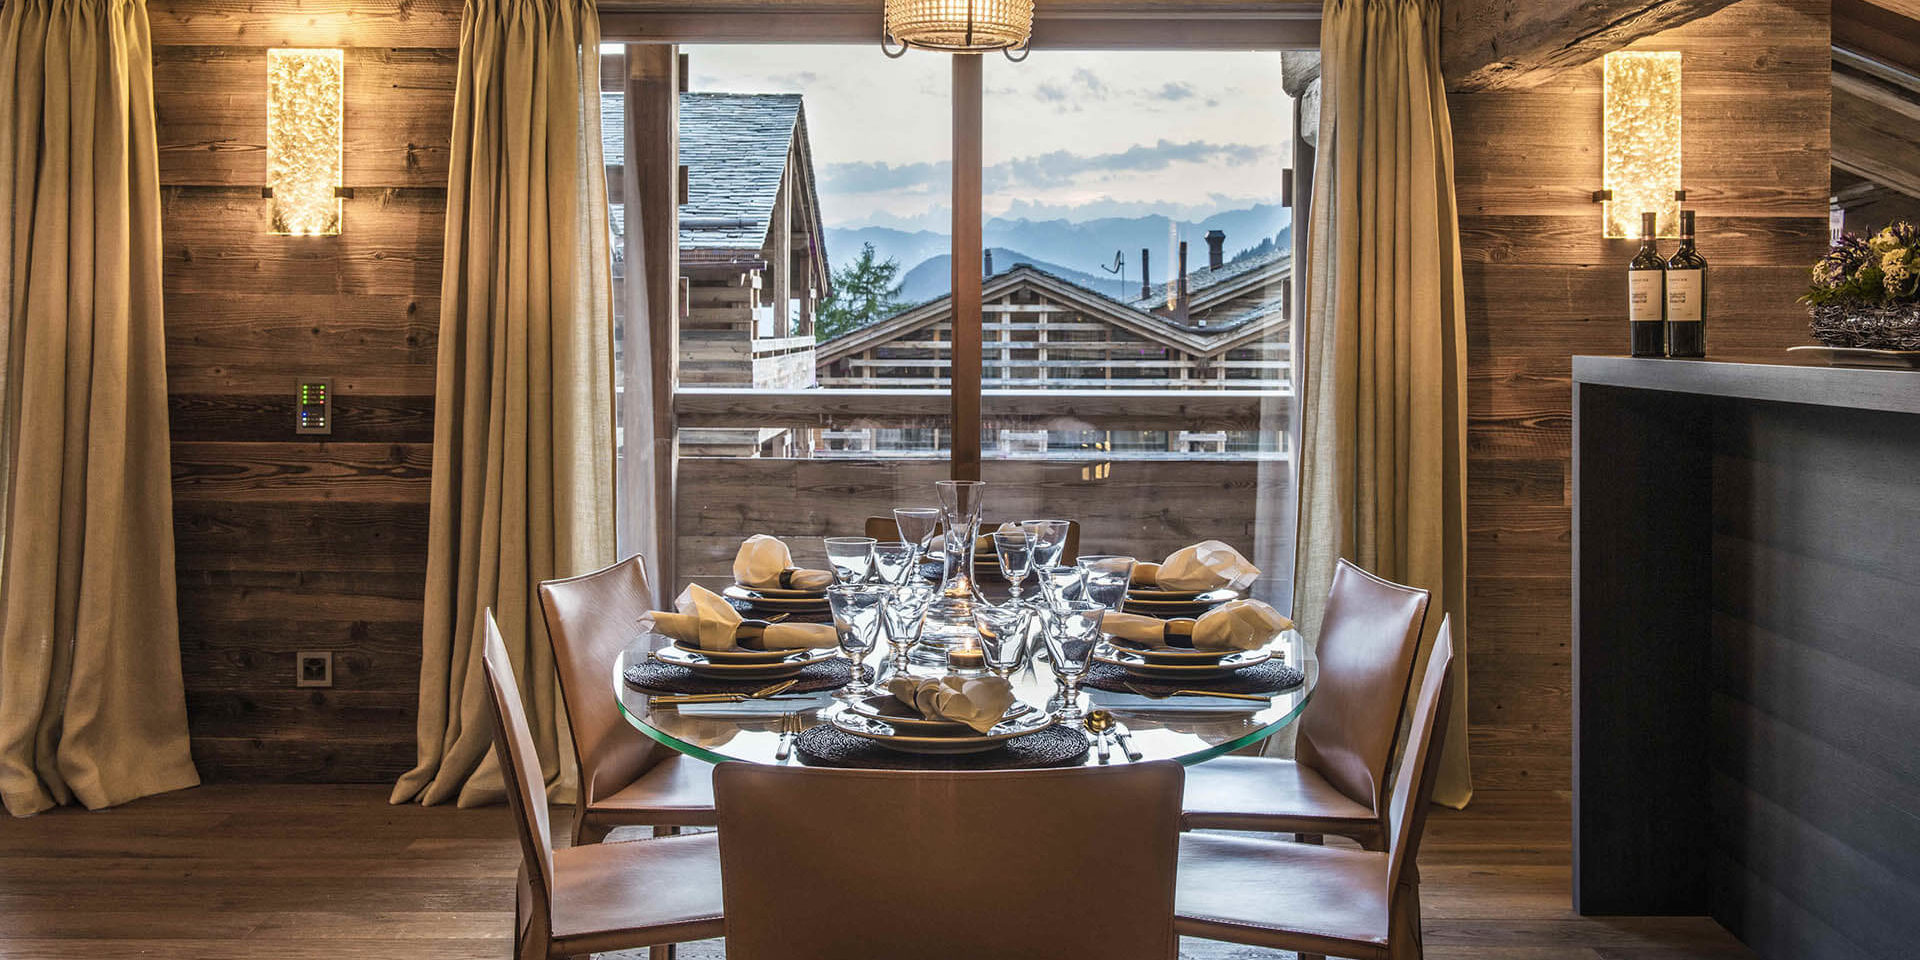 Appartement Place Blanche 2 Verbier Les 4 Vallees Zwitserland wintersport skivakantie luxe eetkamer gedekte tafel karaf hanglamp verlichting bar raam